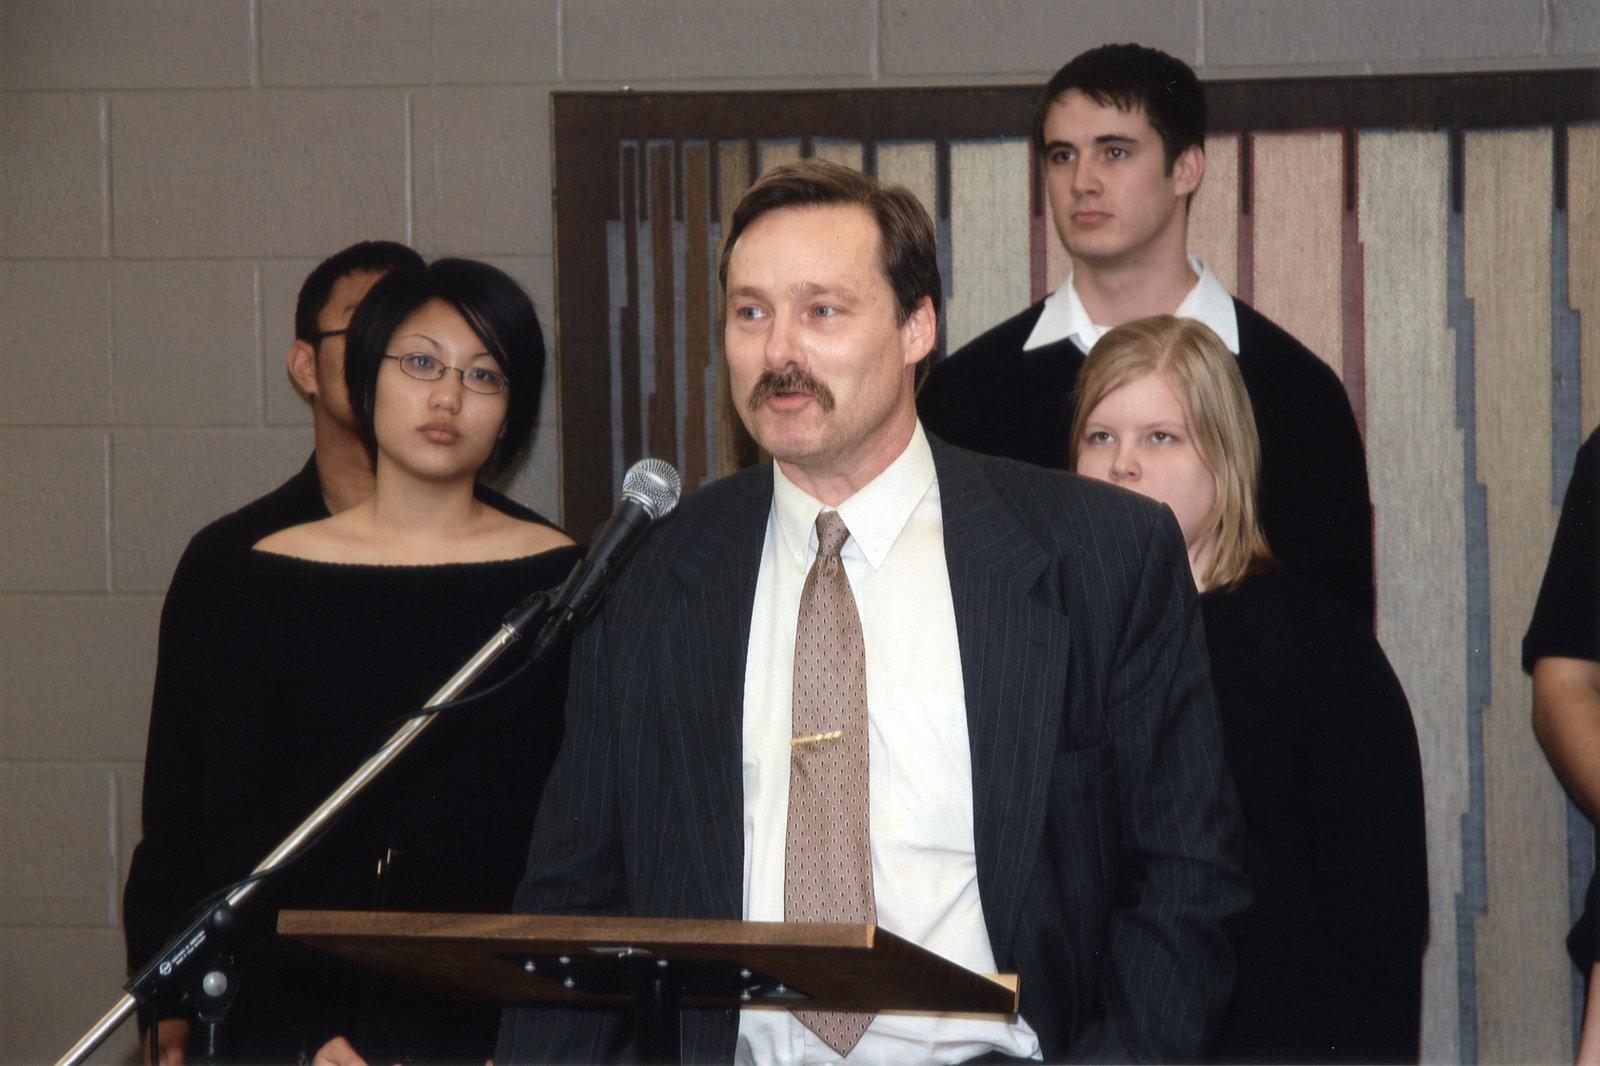 Chris Nighman speaking at unveiling of medieval manuscript